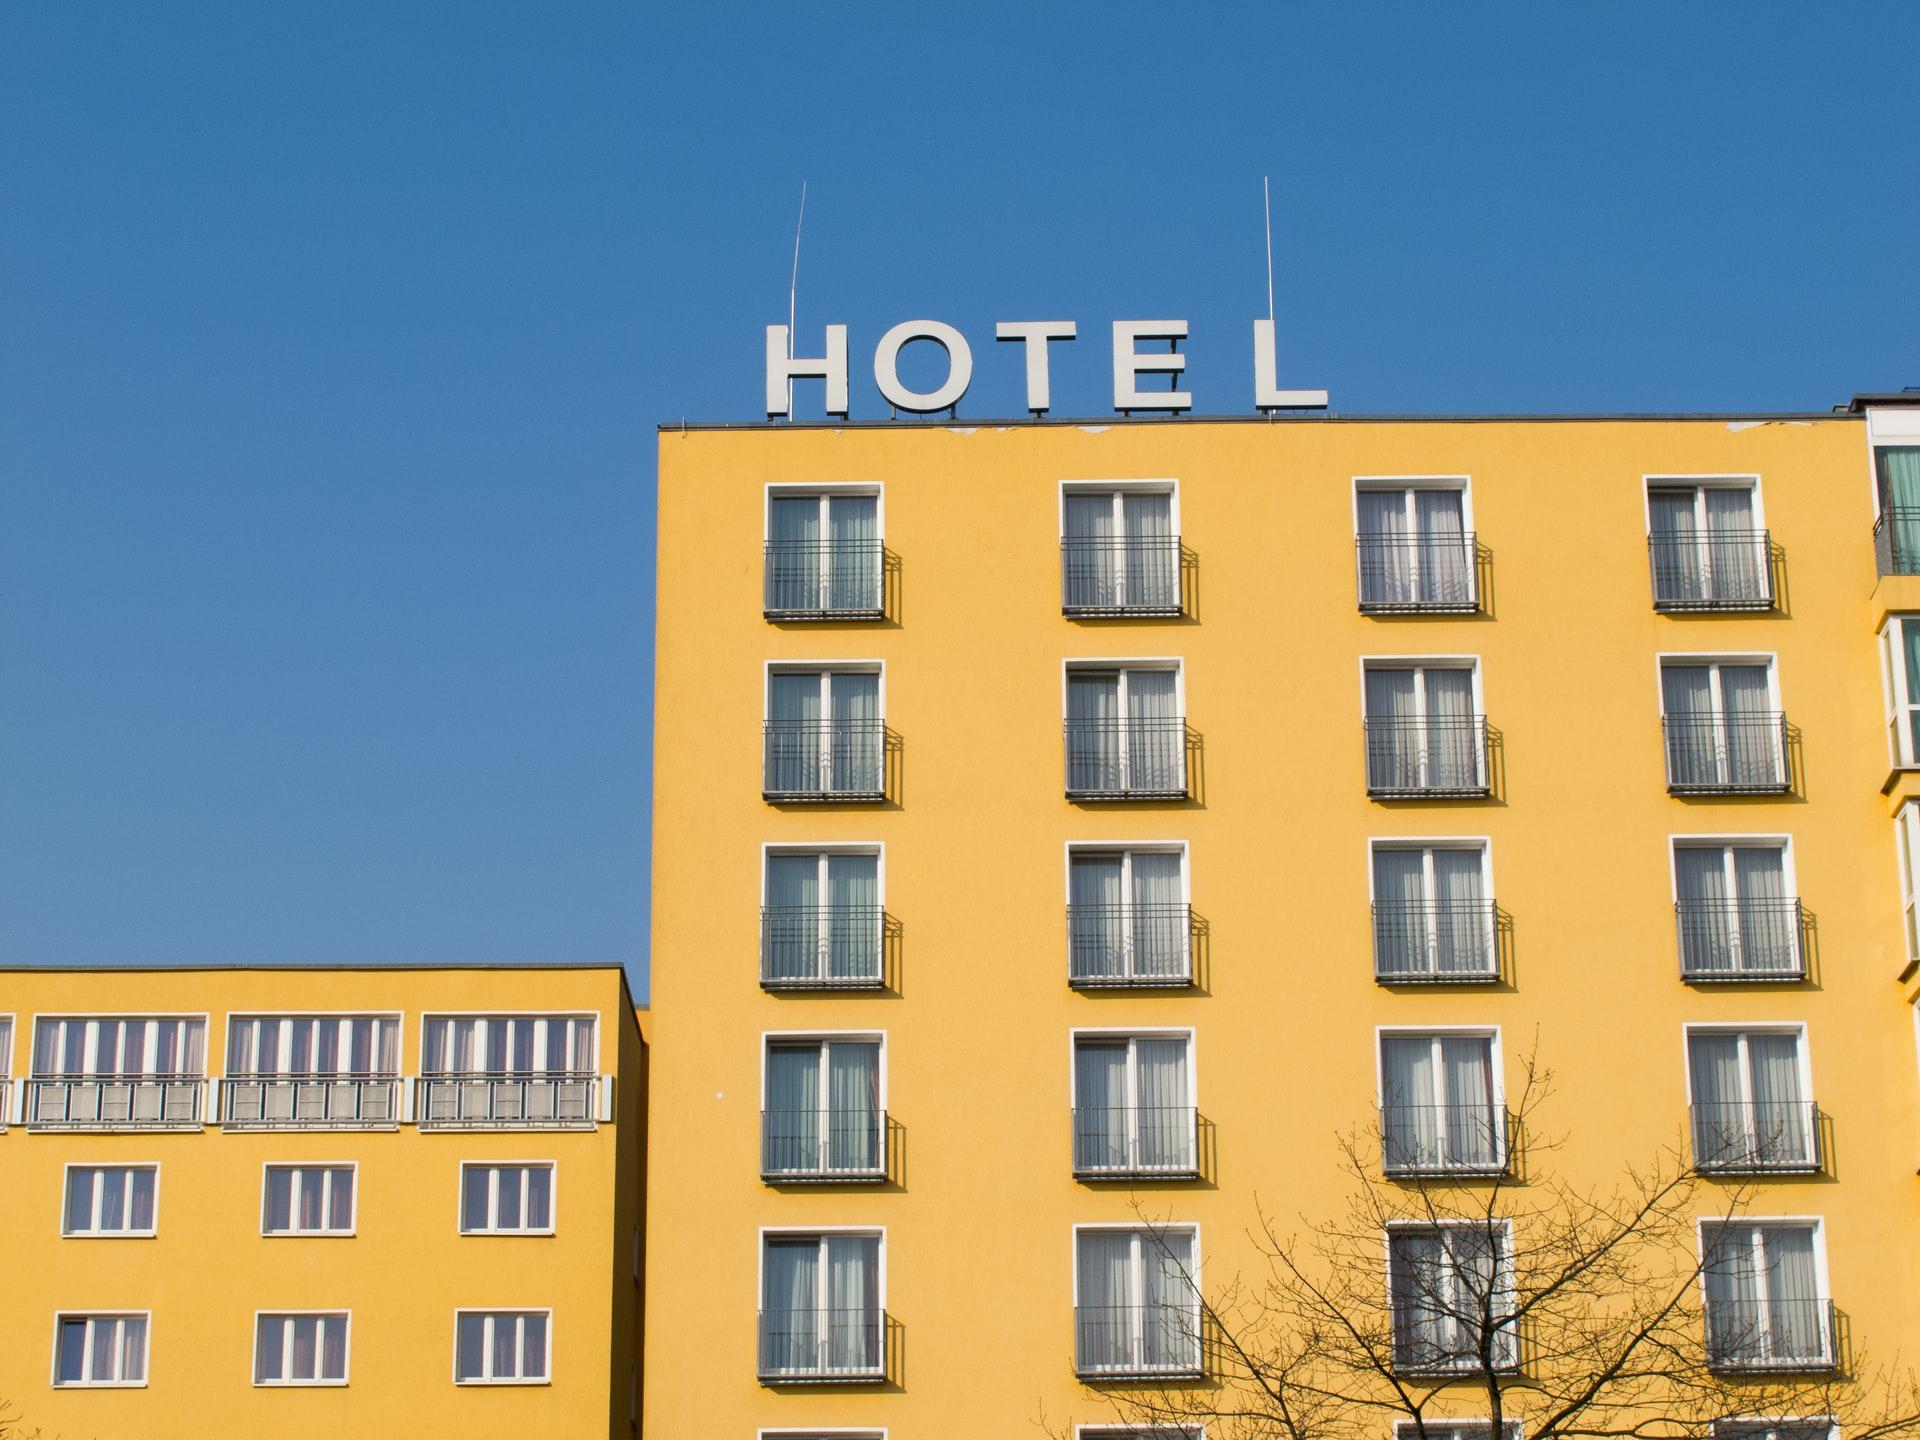 Superbonus 110%: esclusi gli alberghi, inclusi ospedali e caserme